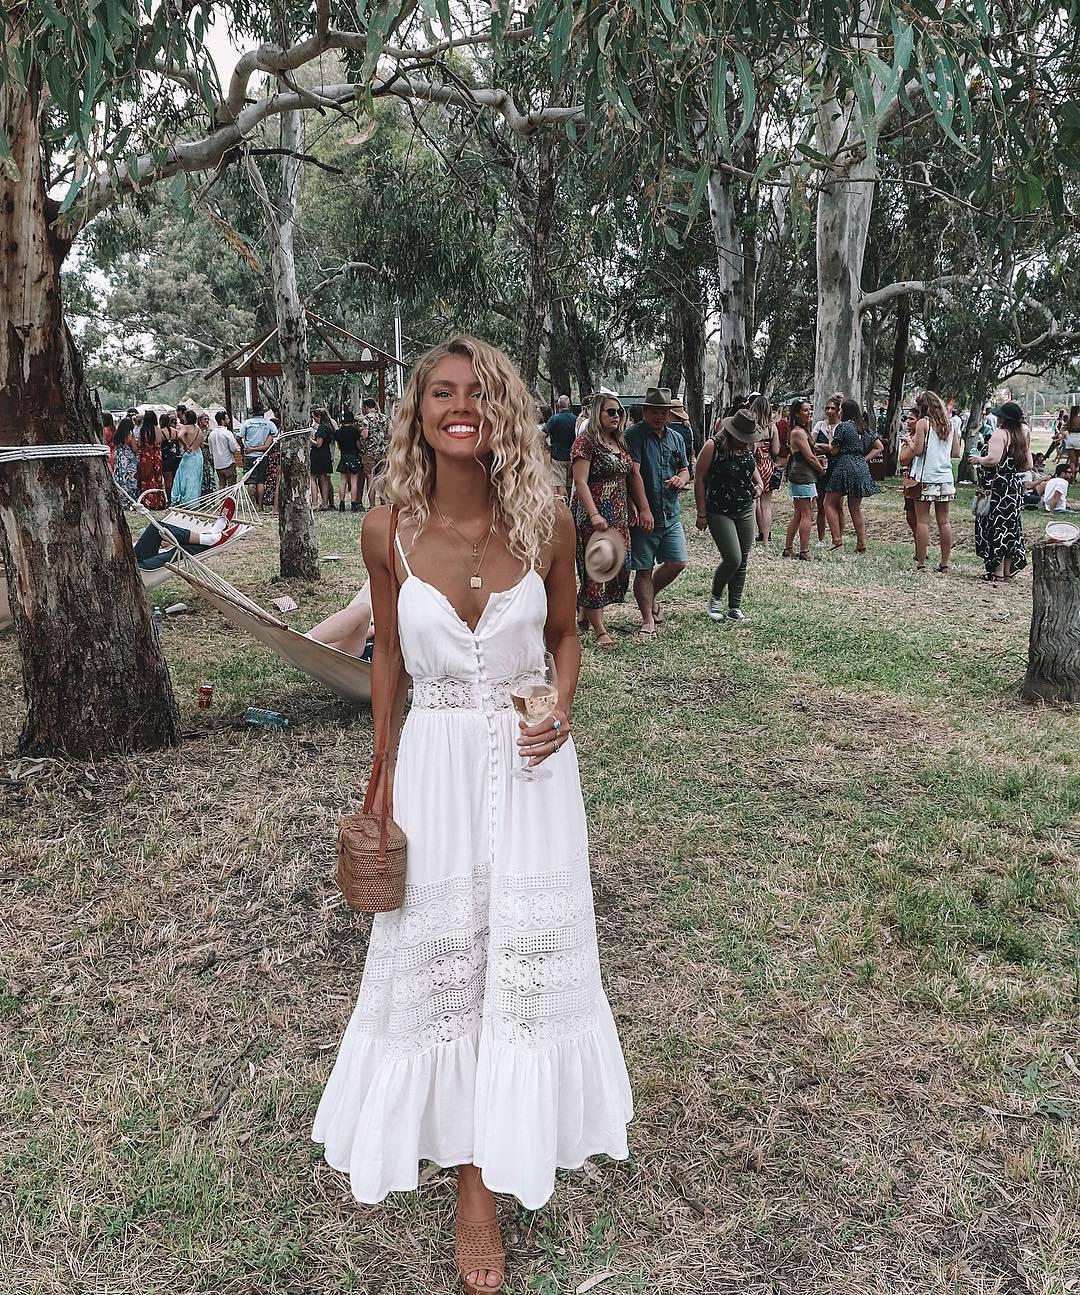 2018 Sexy dentelle sans bretelles femmes robe solide couleur dos nu longue robe blanche douce princesse plage robe Patchwork Boho robes